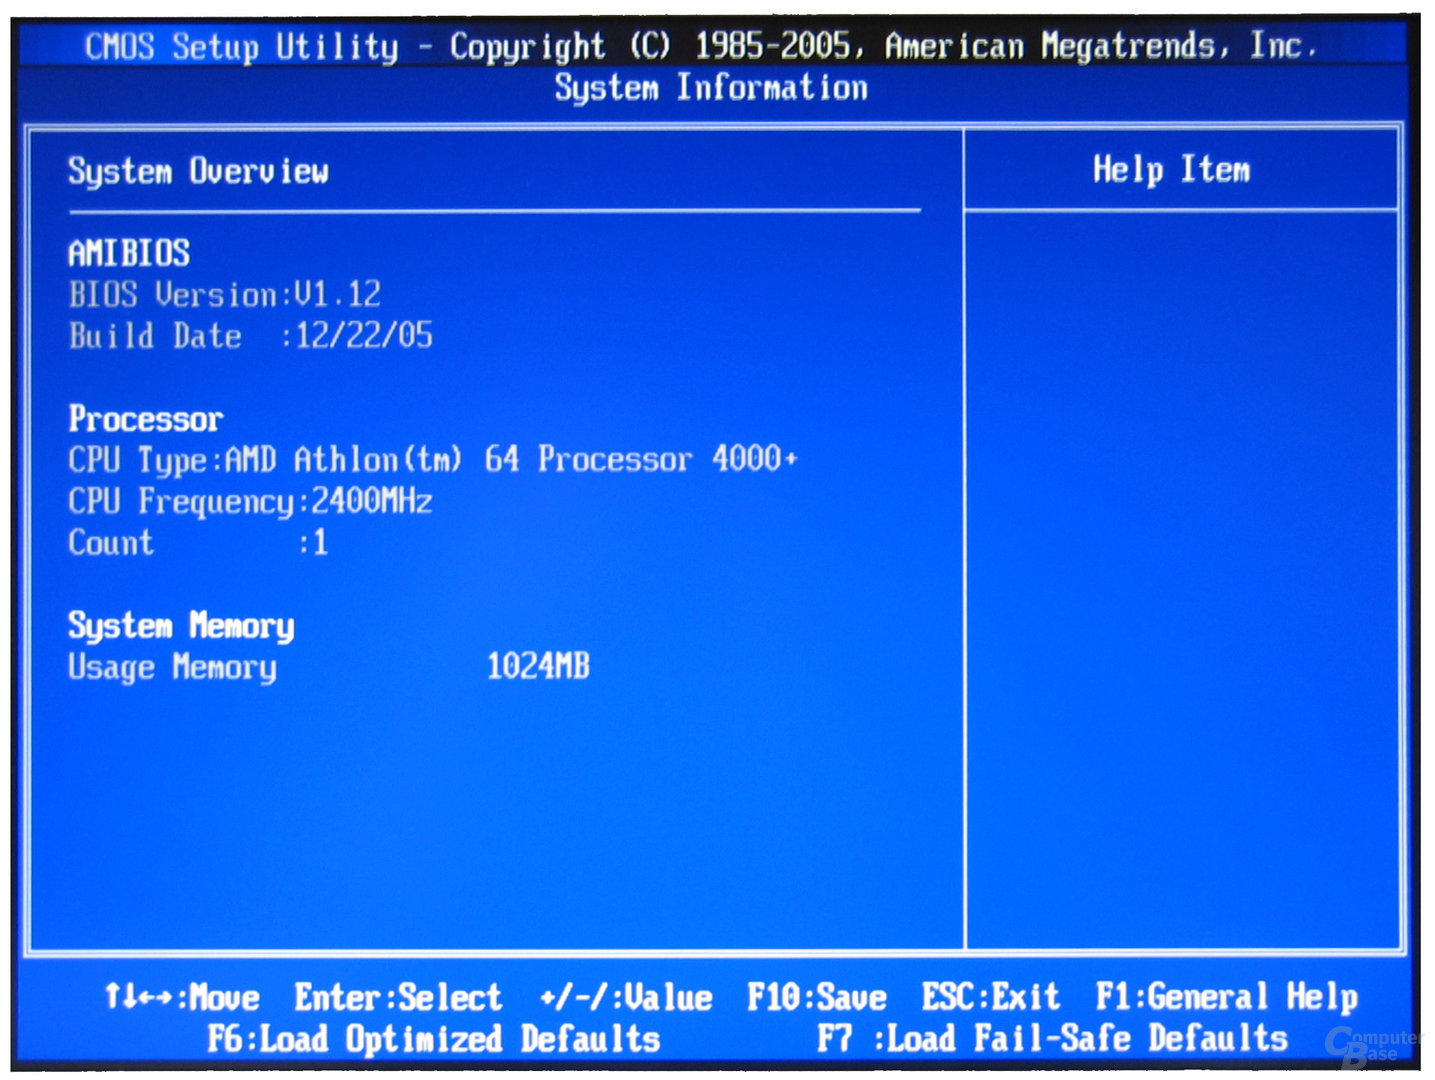 MSI K8N Diamond Plus BIOS